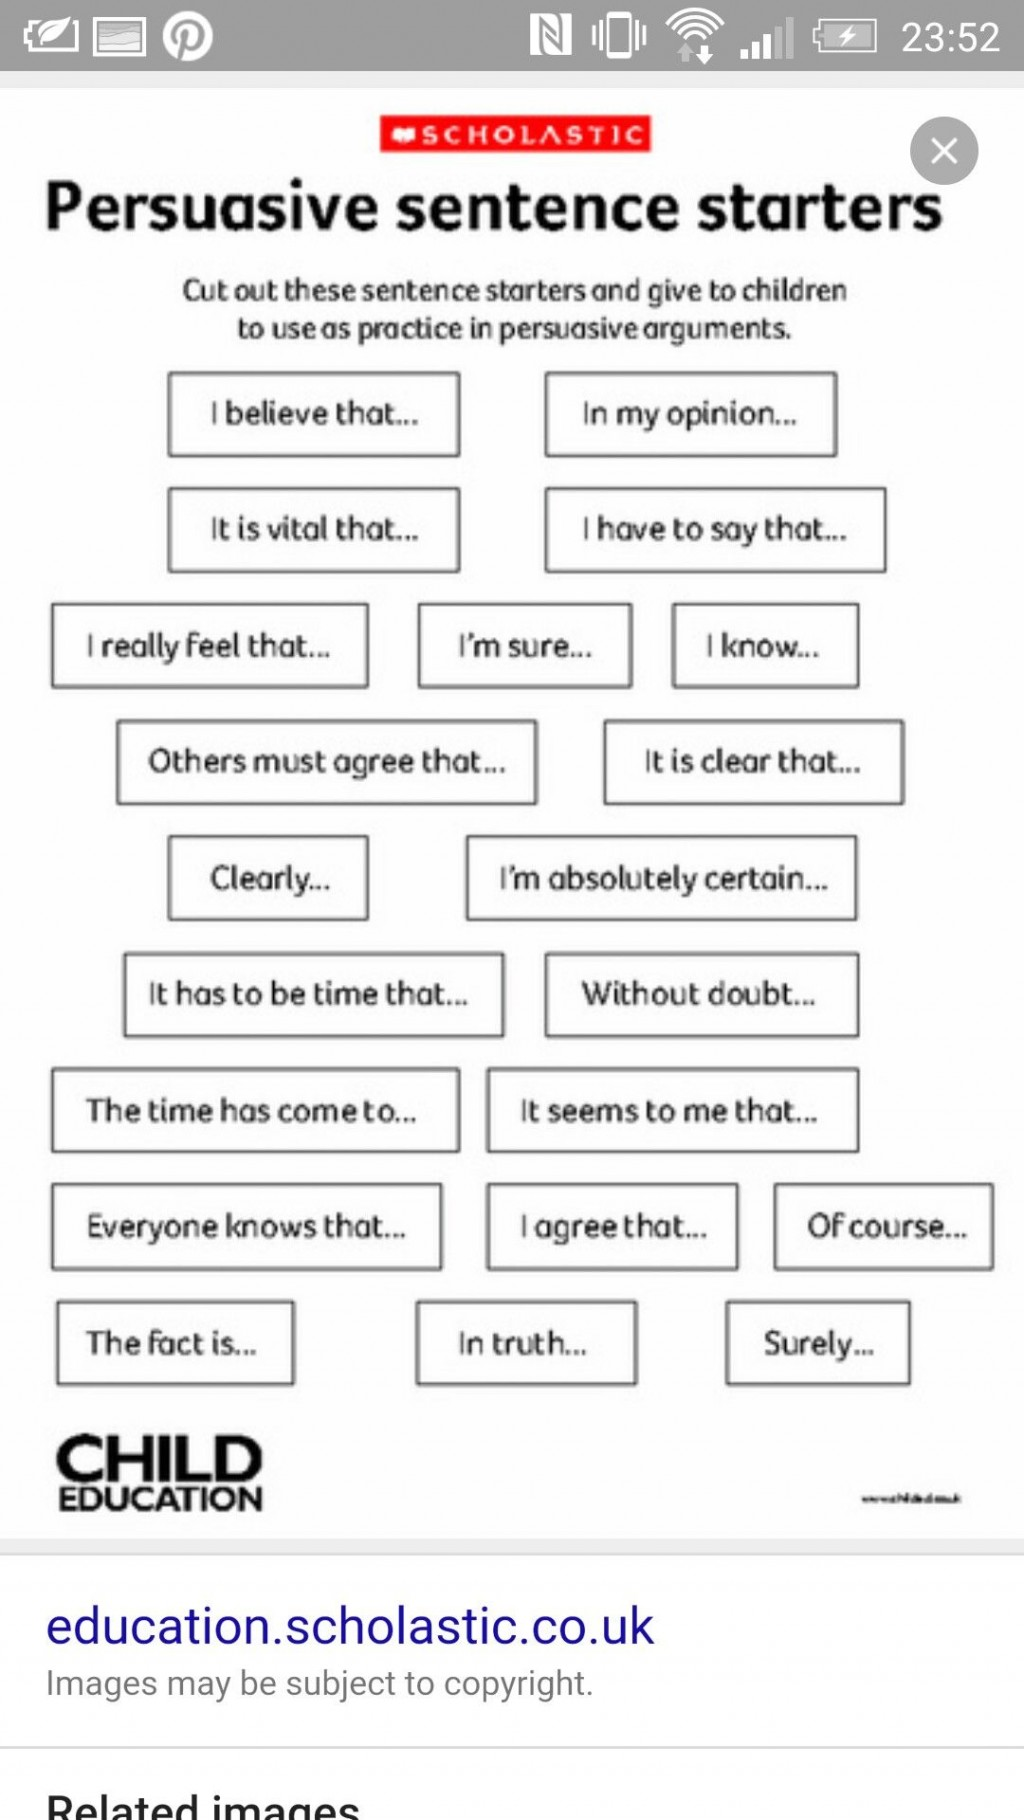 003 Essay Example Paragraph Starters Excellent Sentence Spanish Gcse Large